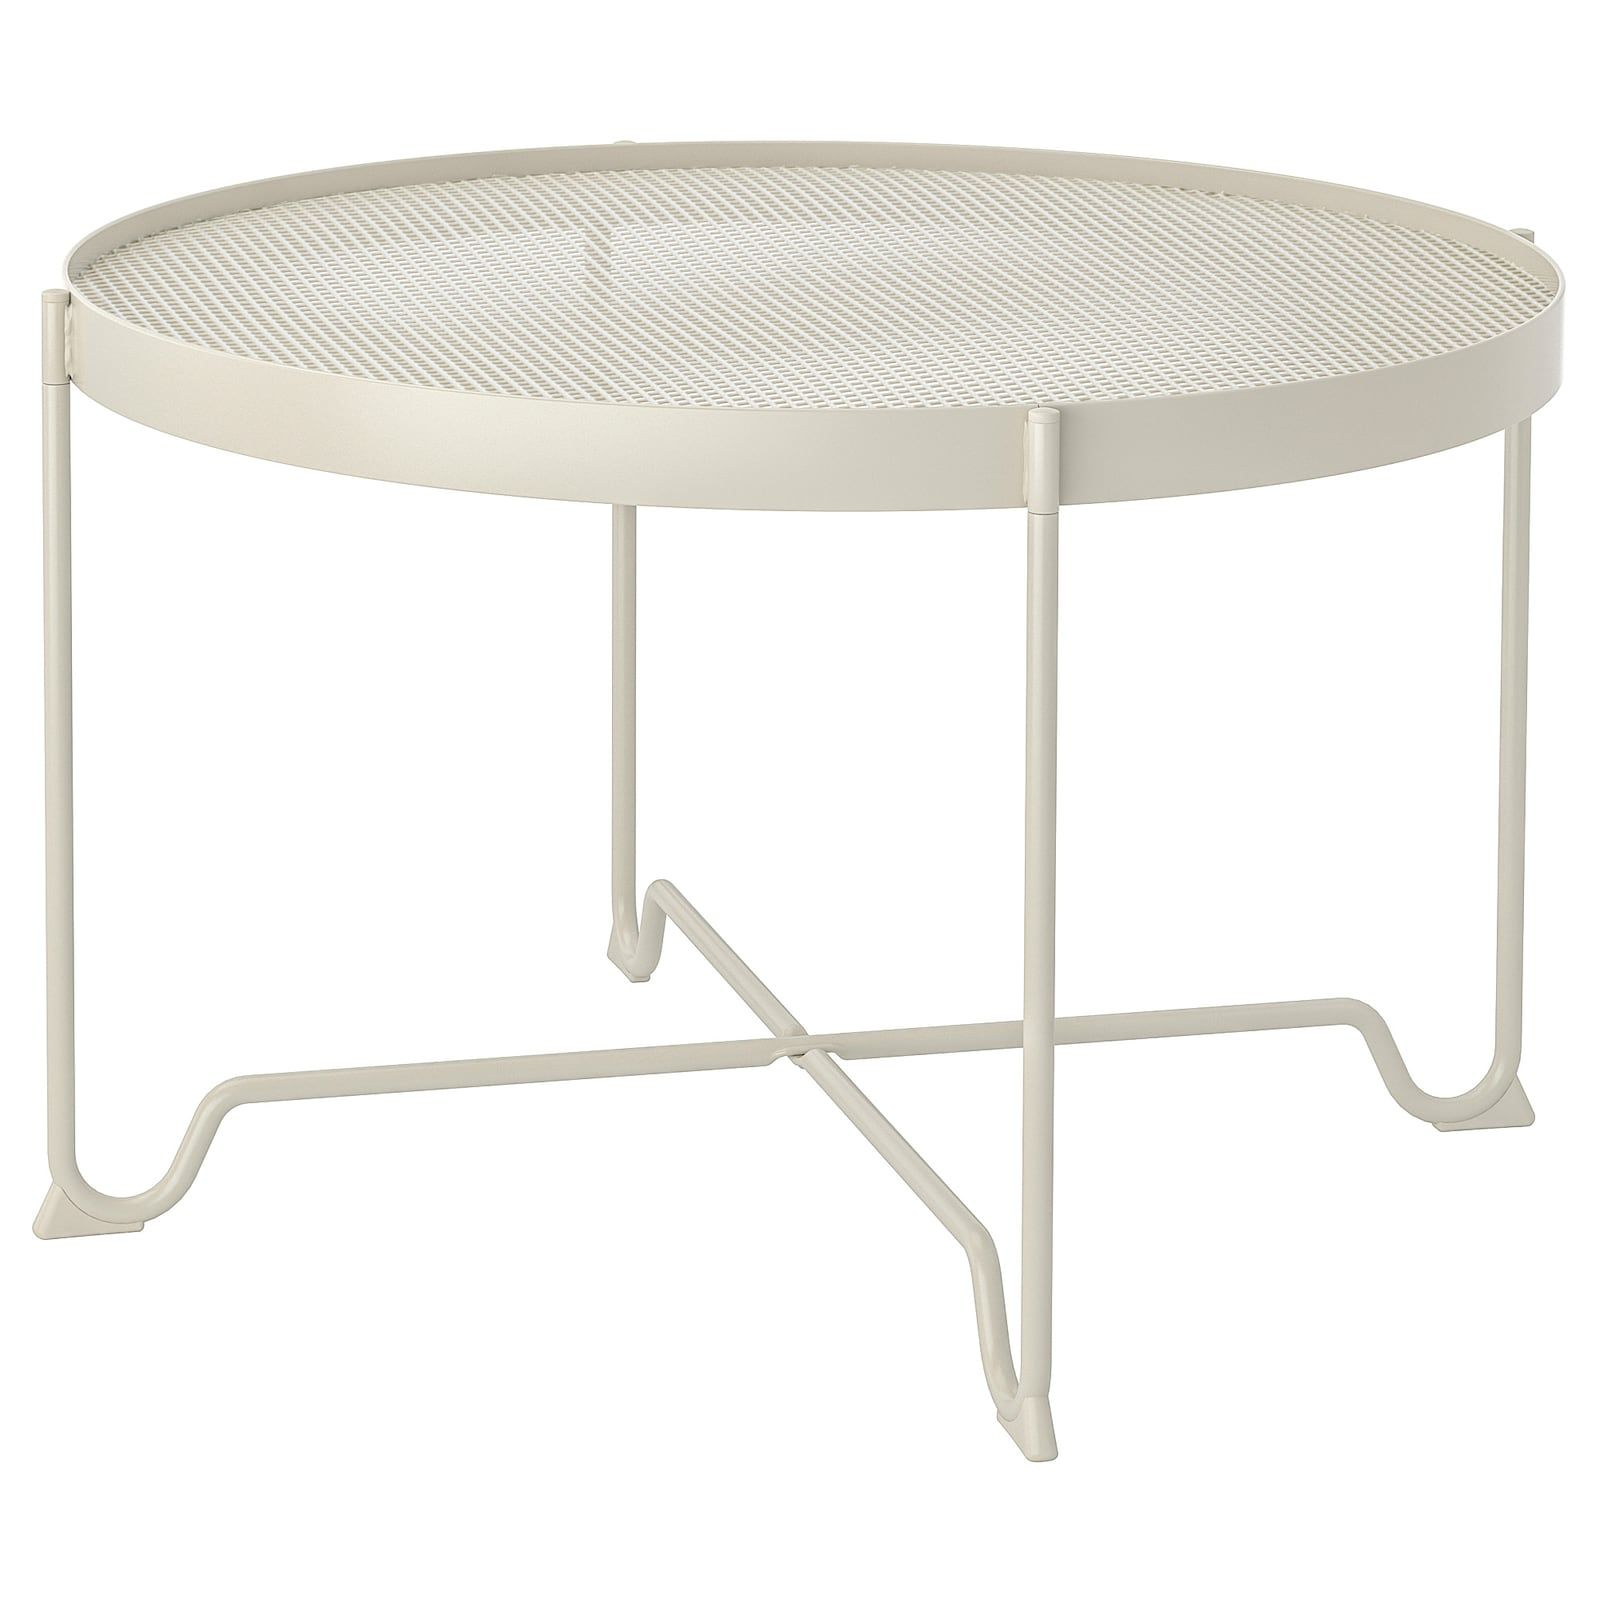 Https Www Ikea Com No No P Krokholmen Sofabord Utendors Beige 80336466 Ikea Coffee Table Ikea Lack Coffee Table Outdoor Coffee Tables [ 1600 x 1600 Pixel ]